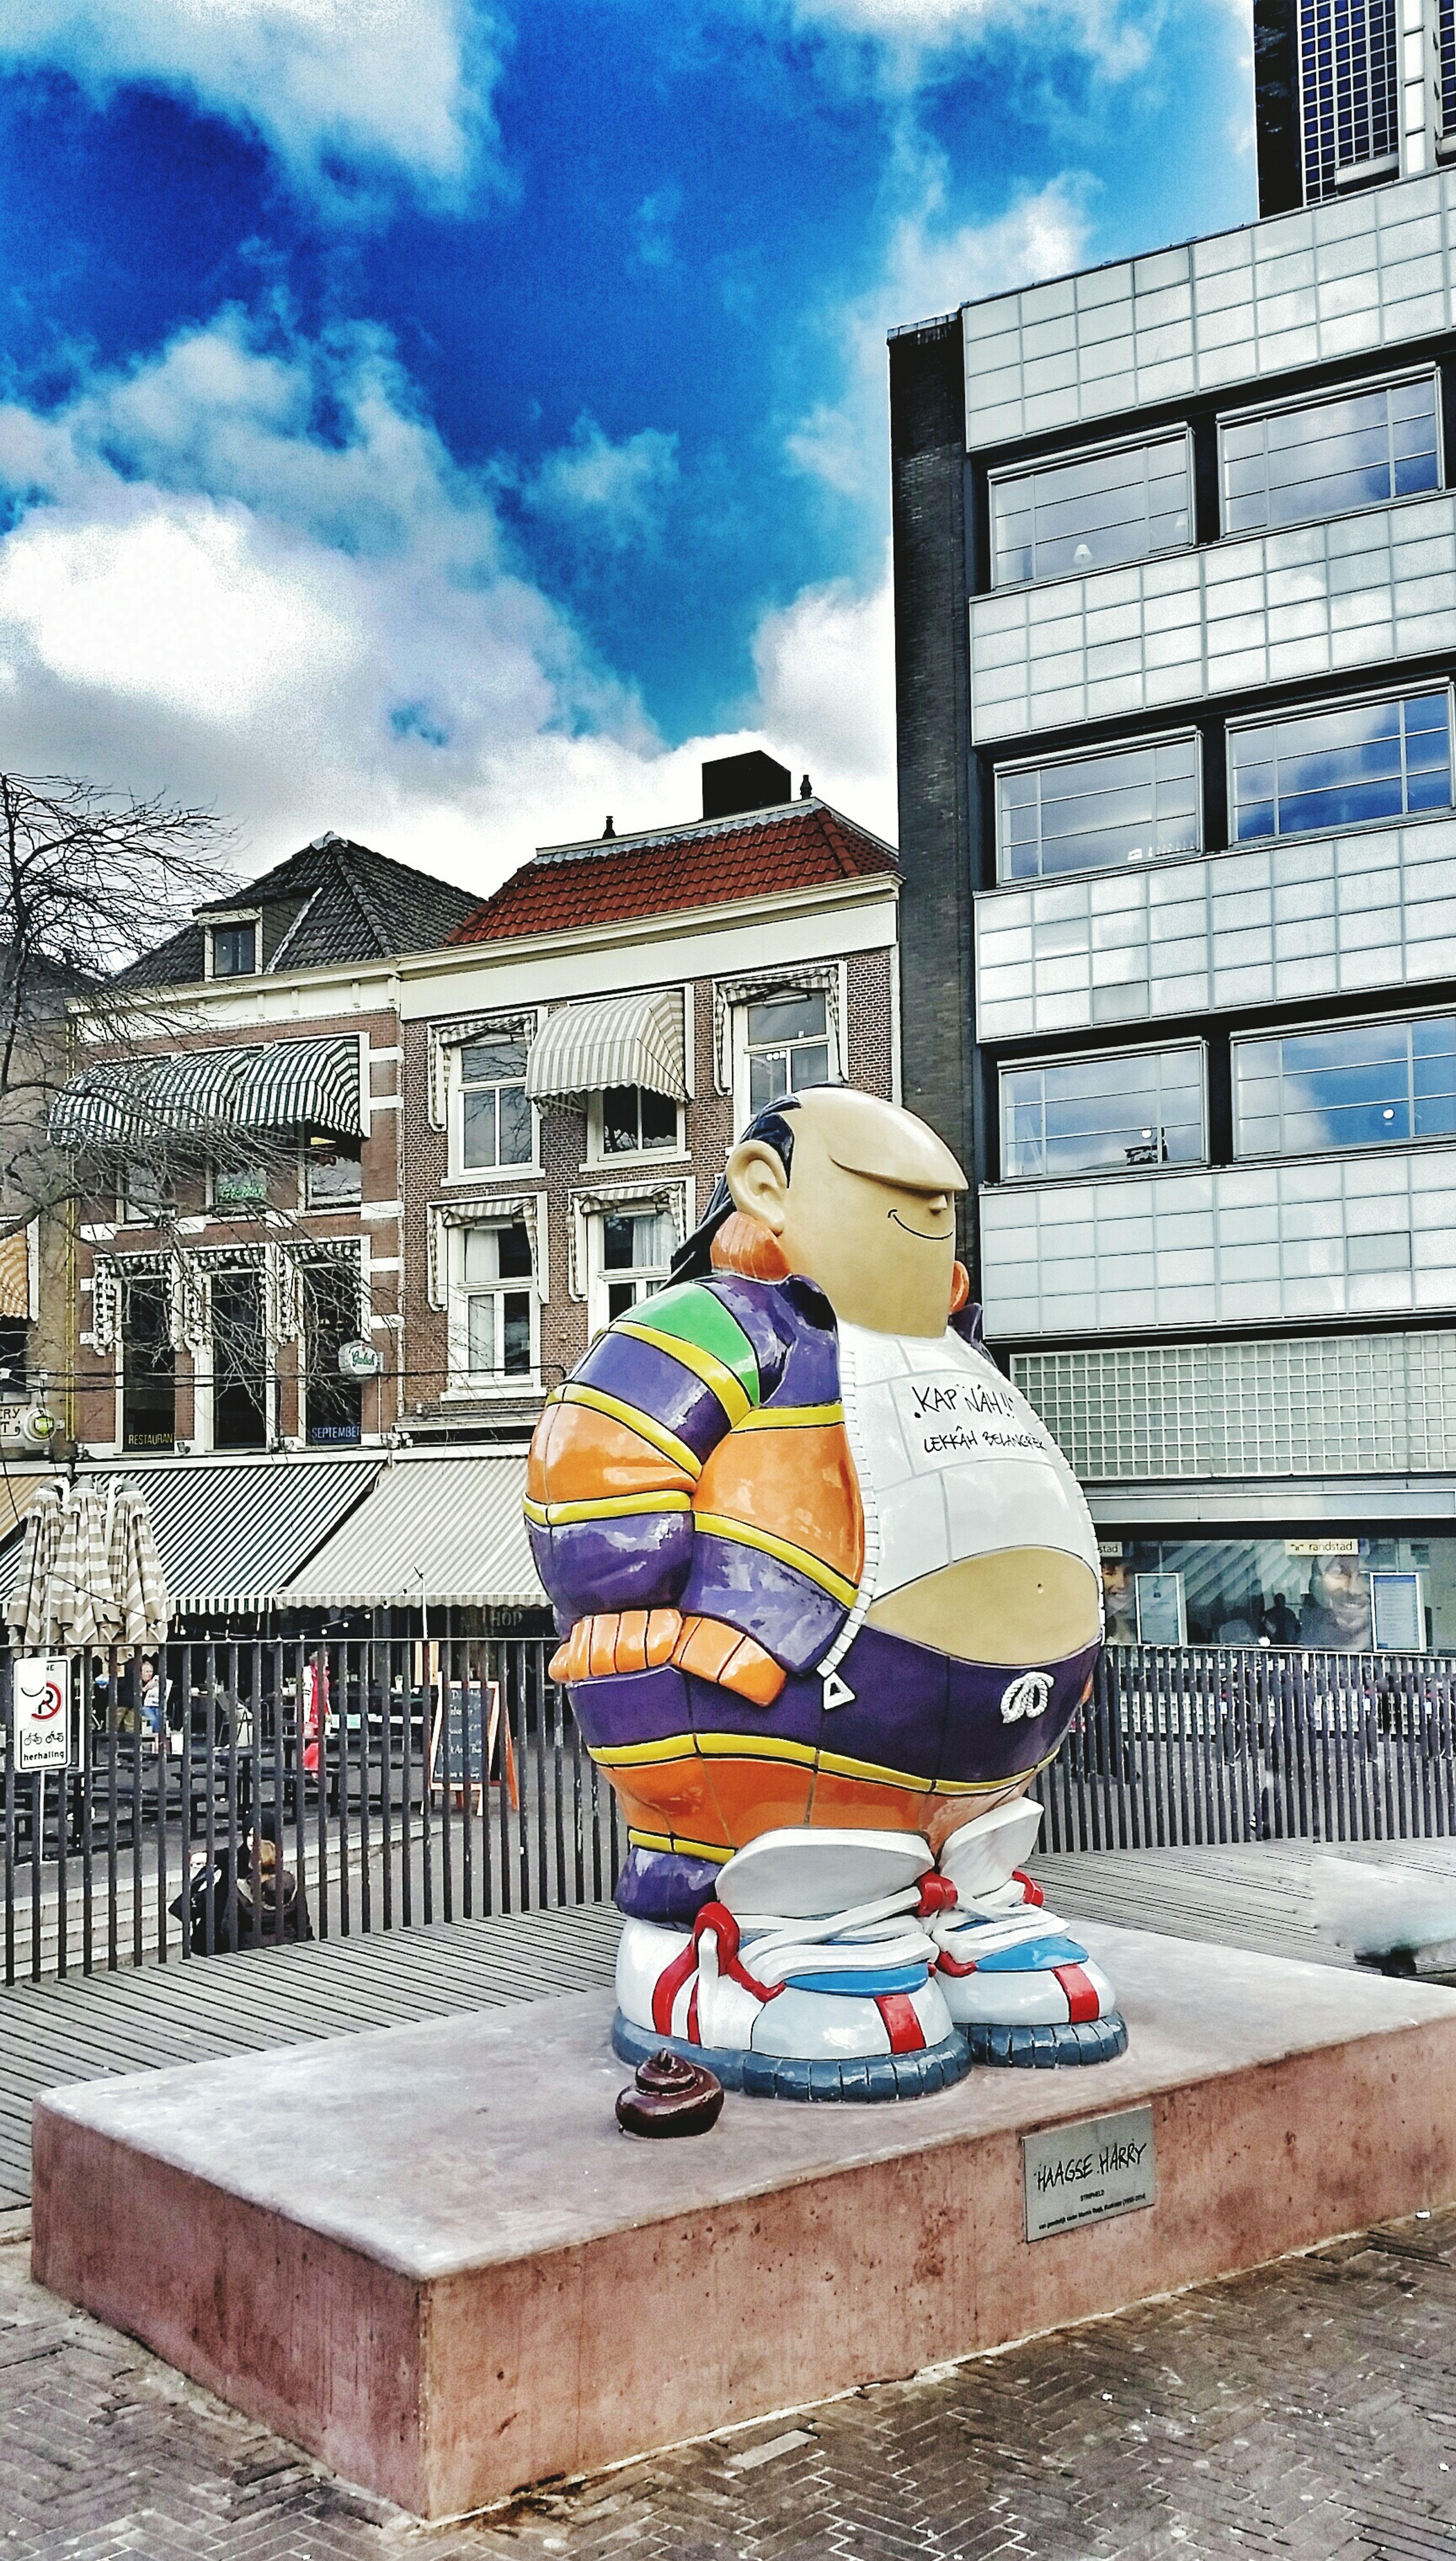 Haagse Harrie DenHaag Statue Art Taking Photos Grote Markt MarnixRueb Zwarte Ruiter Blue Sky Samsung Galaxy S5